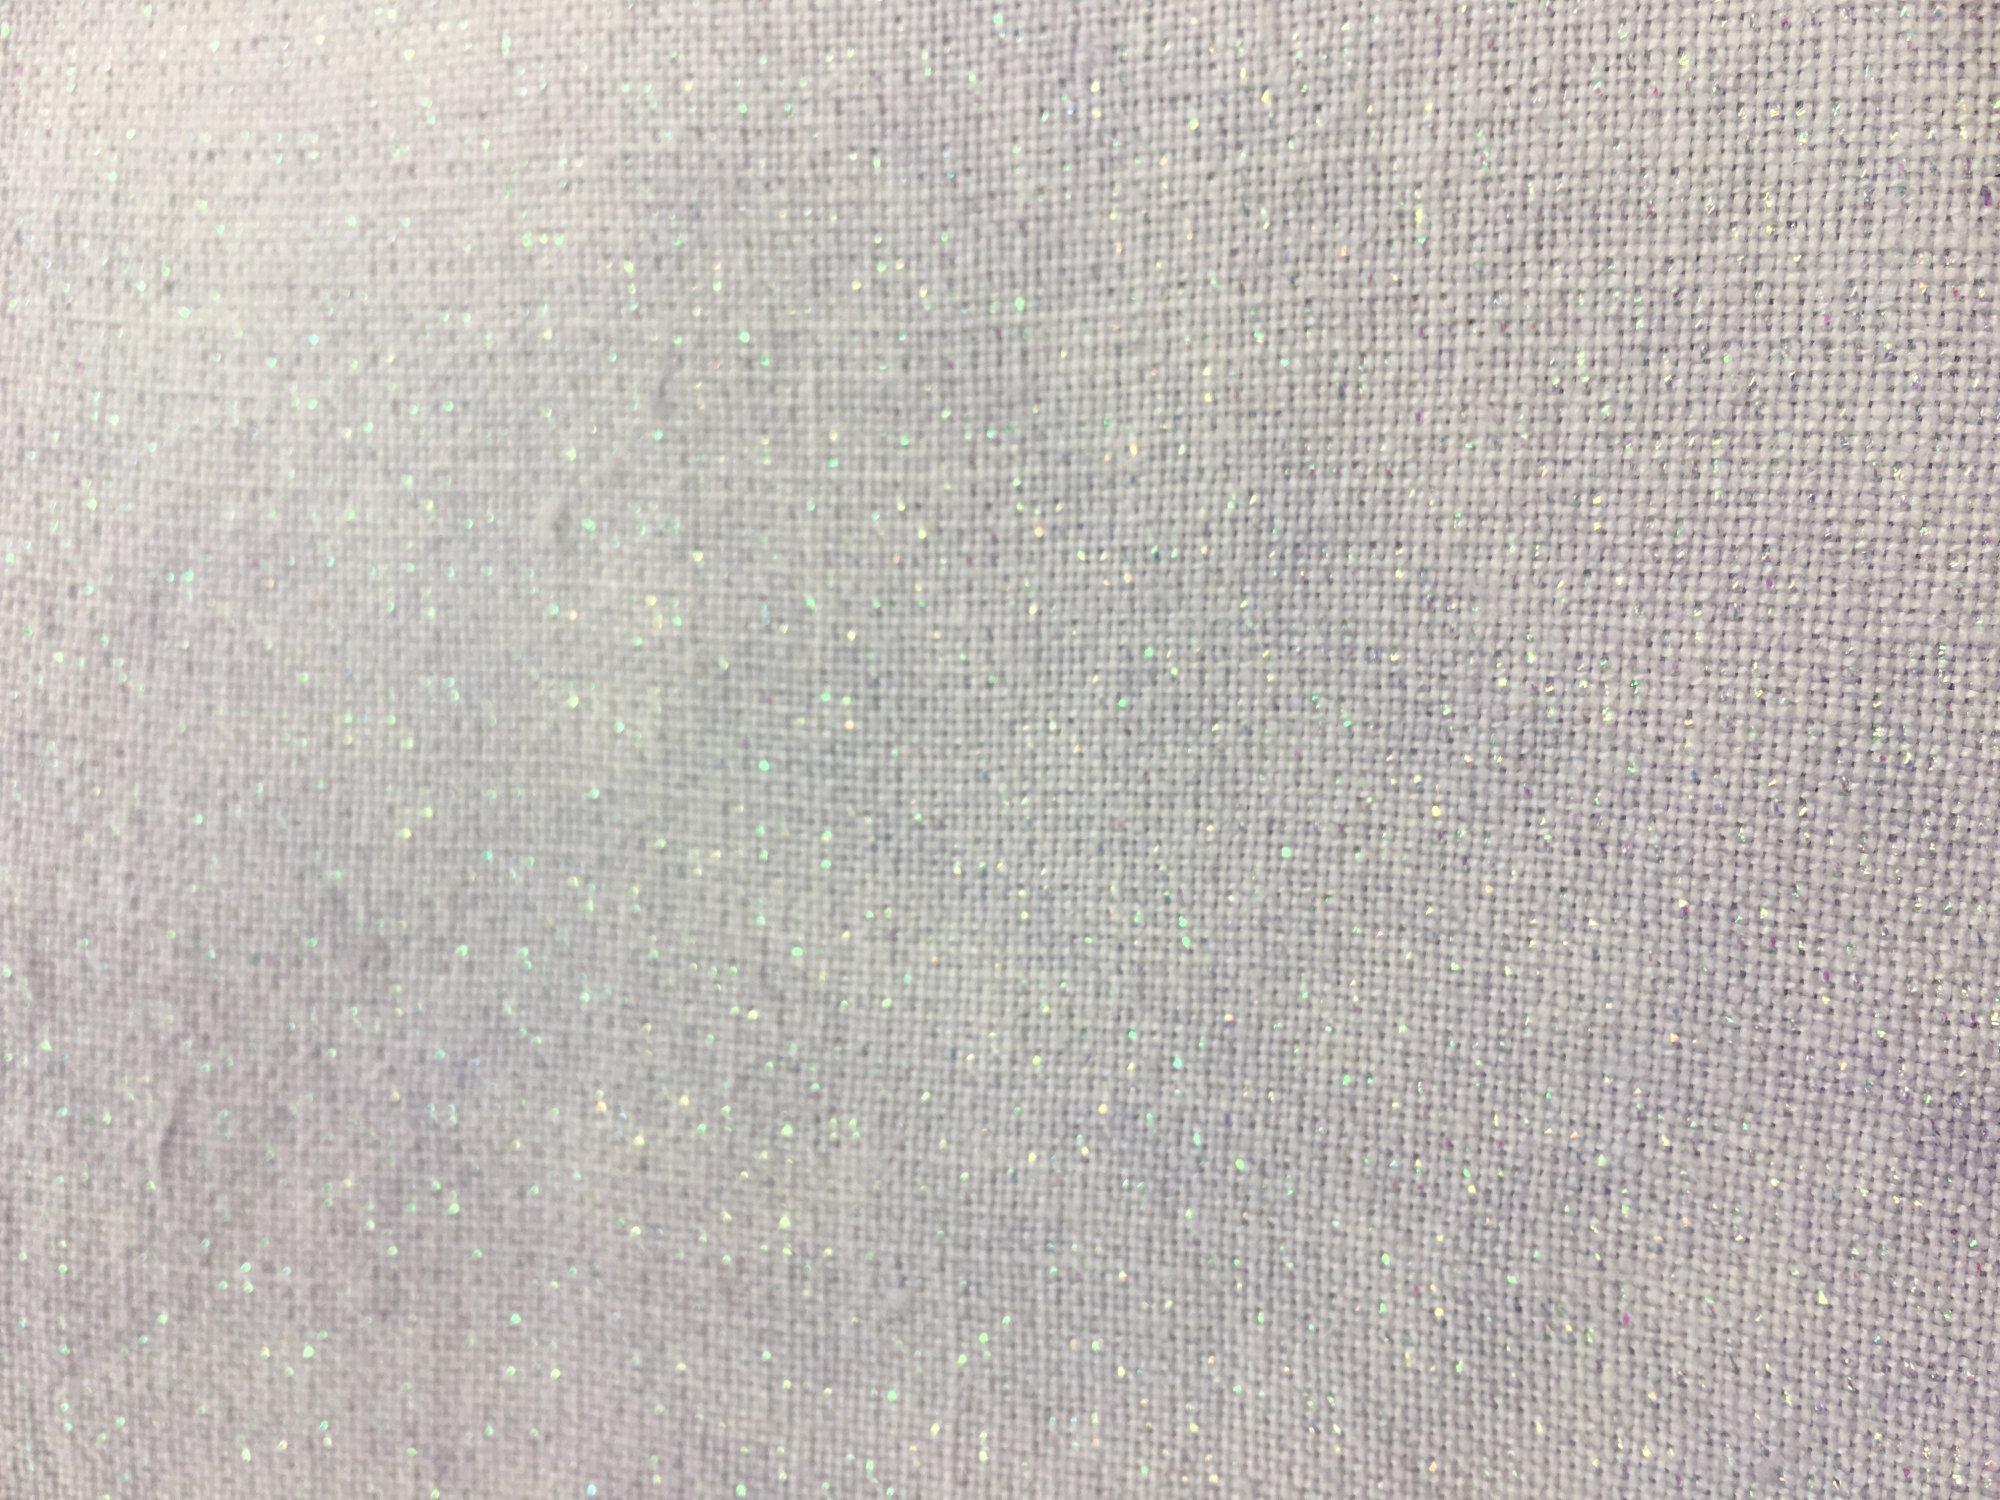 Silkweaver Periwinkle Prism Opalescent cashel 28ct